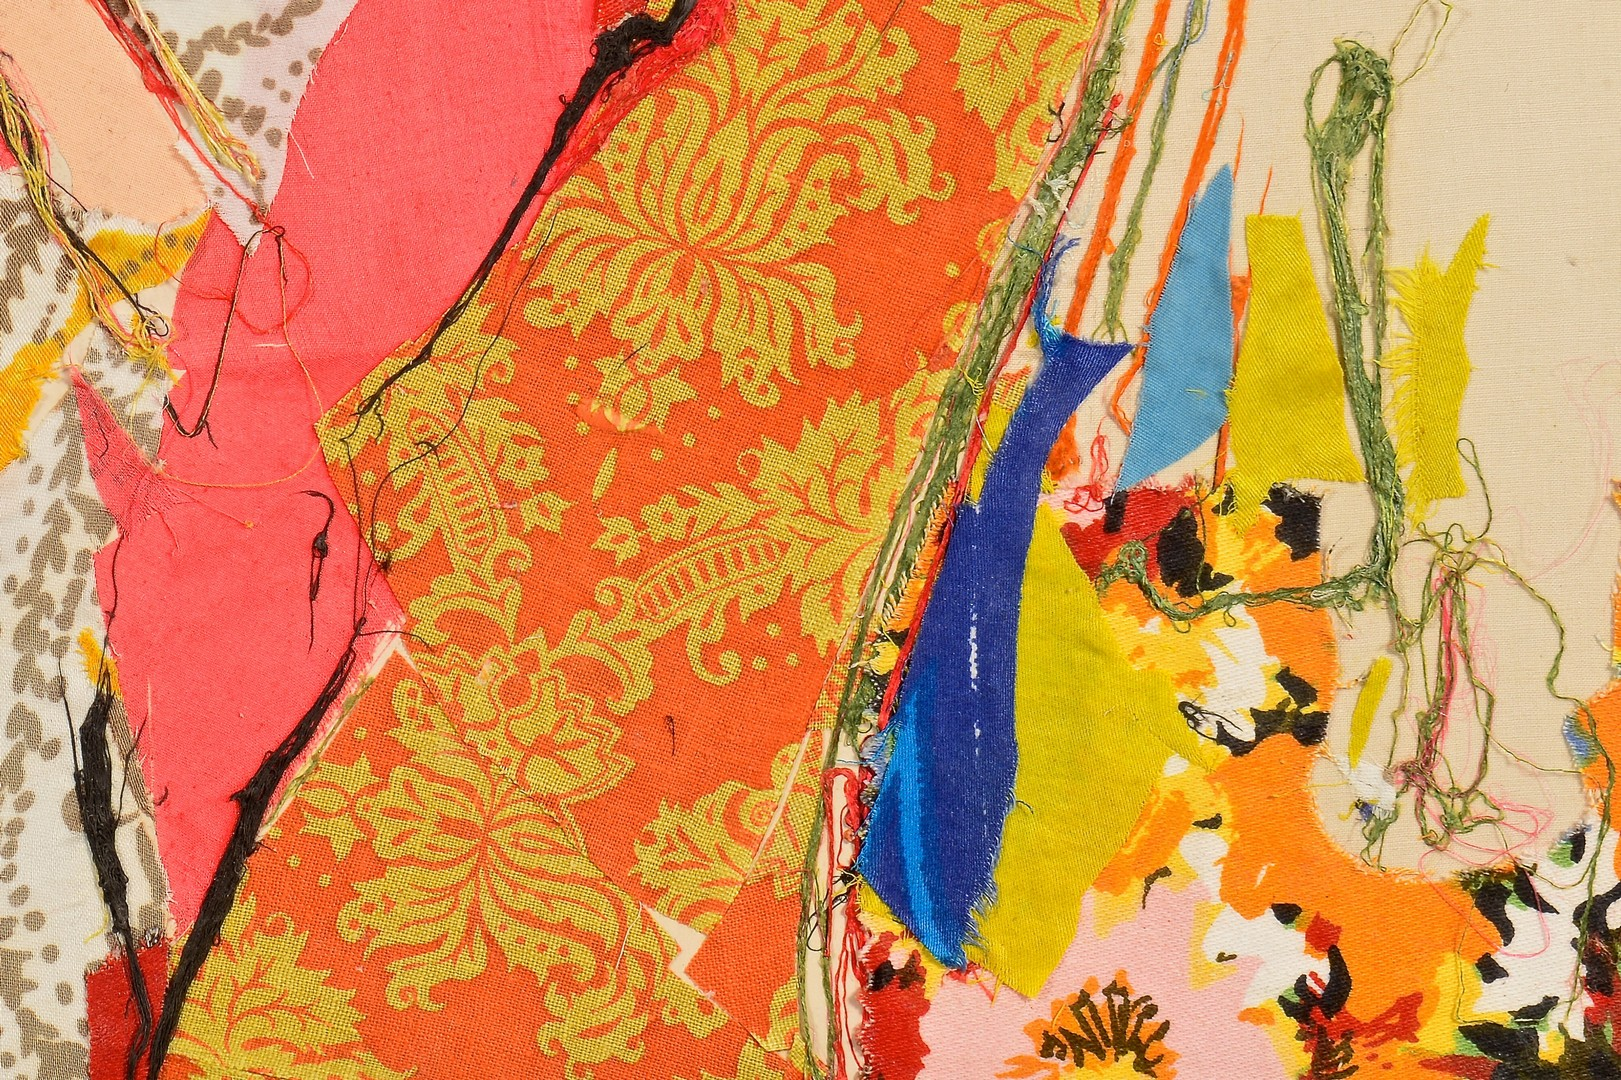 Lot 849: Ella Raayoni collage